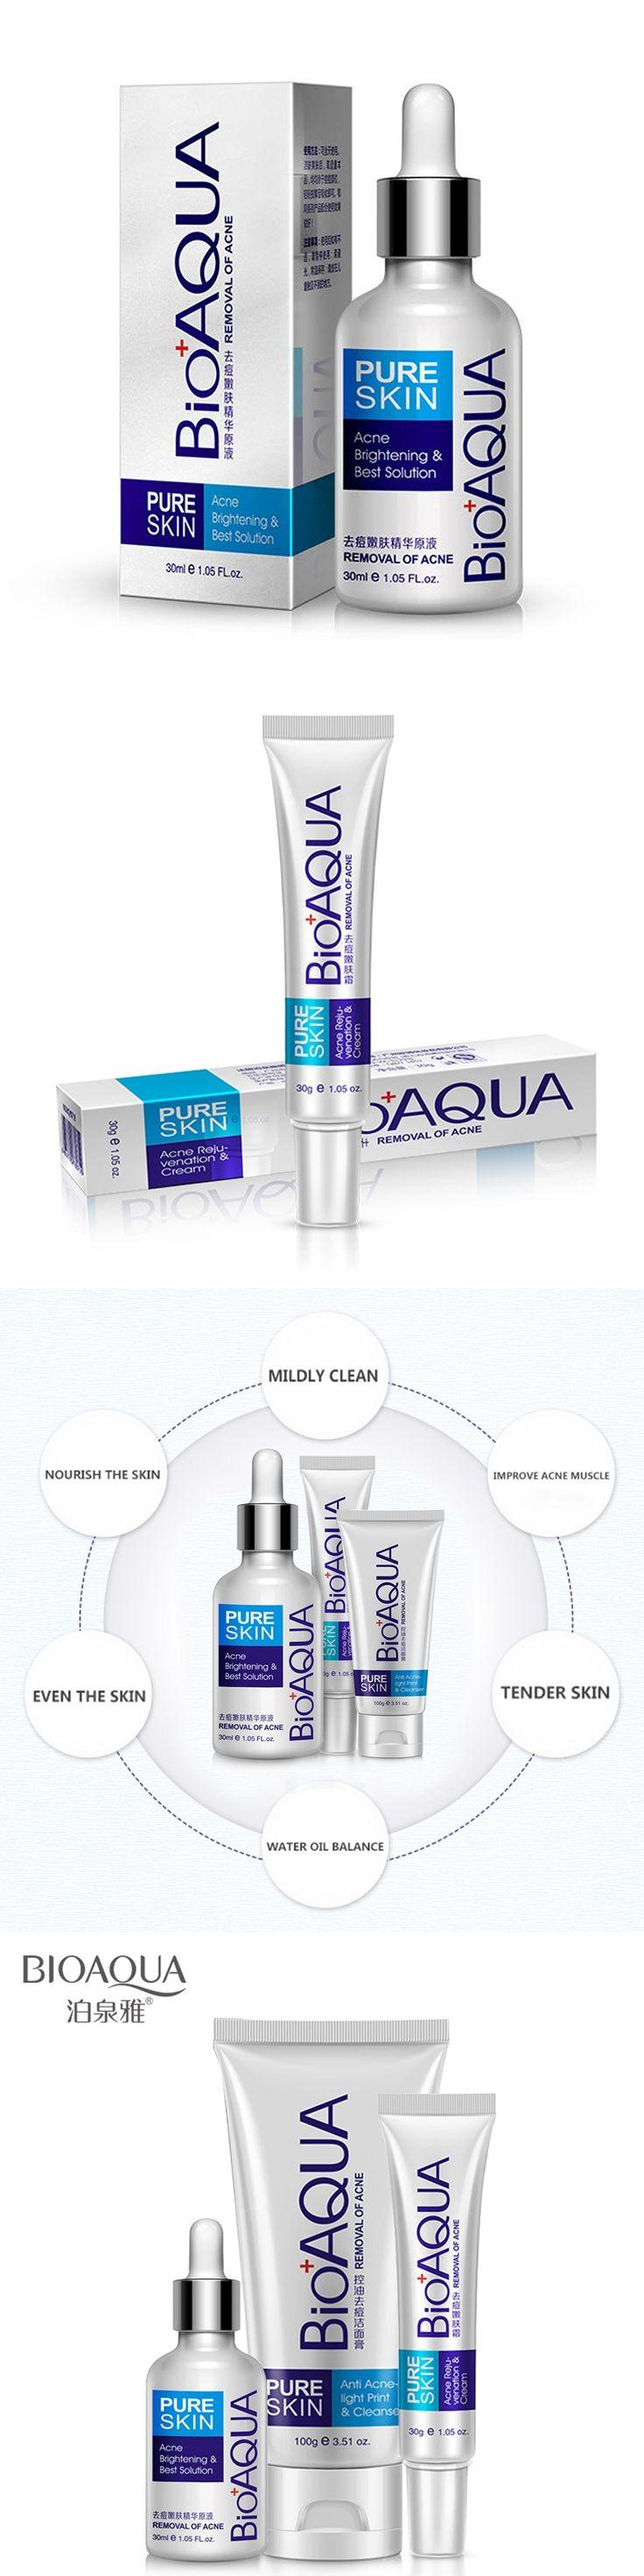 BIOAQUA 3 kins/sets Face Care Repair Acne Scar Cream Acne Anti essence Skin Care  deep clean Product